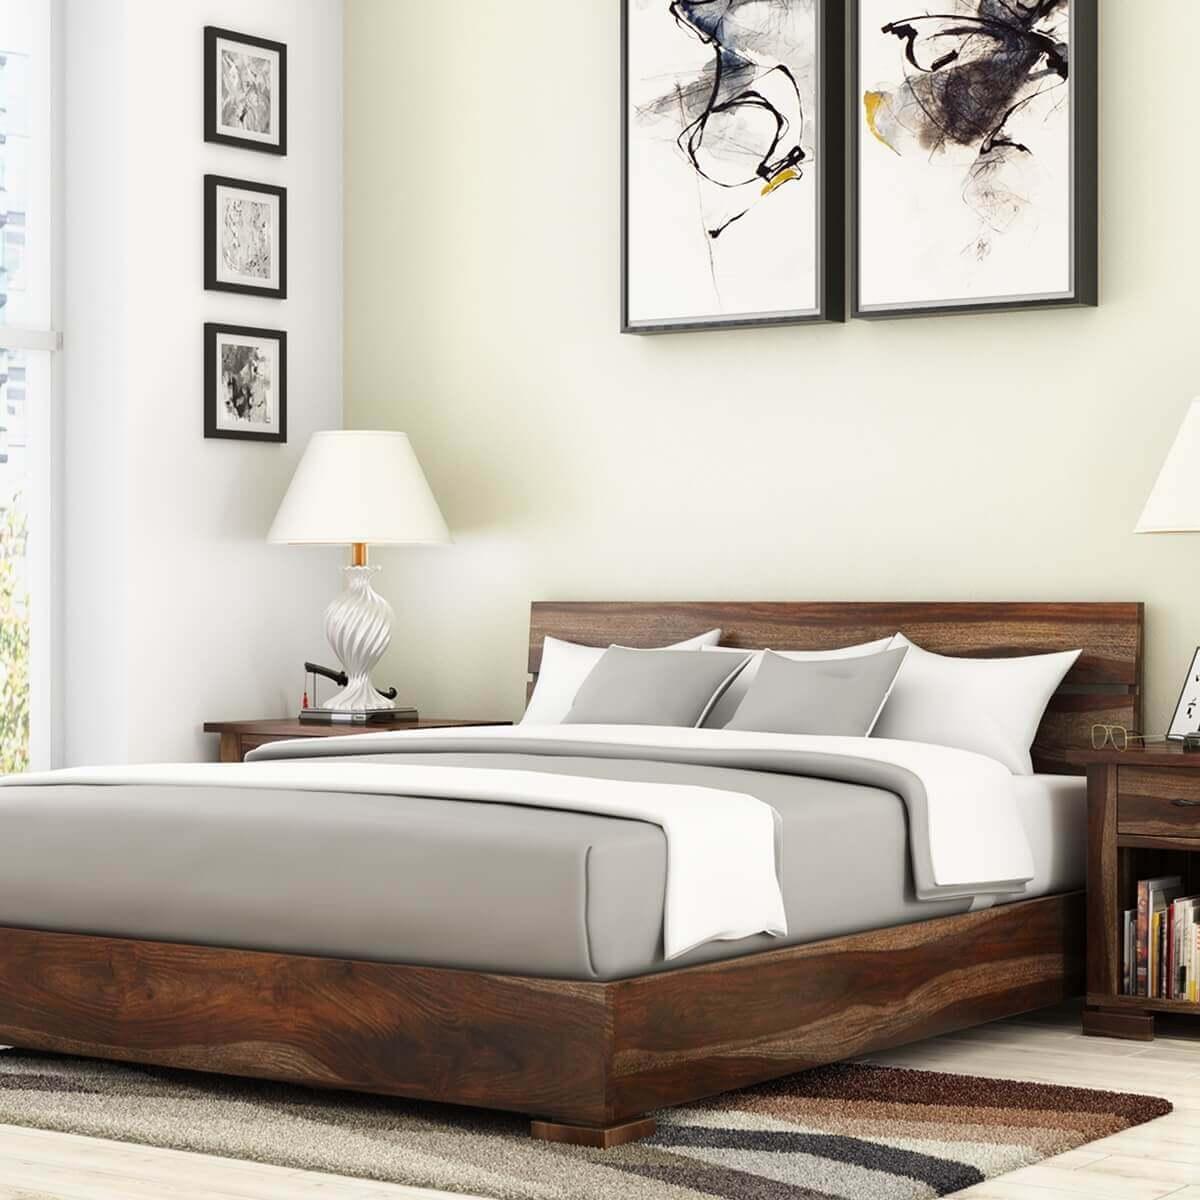 Athena Handcrafted Solid Wood Platform Bed